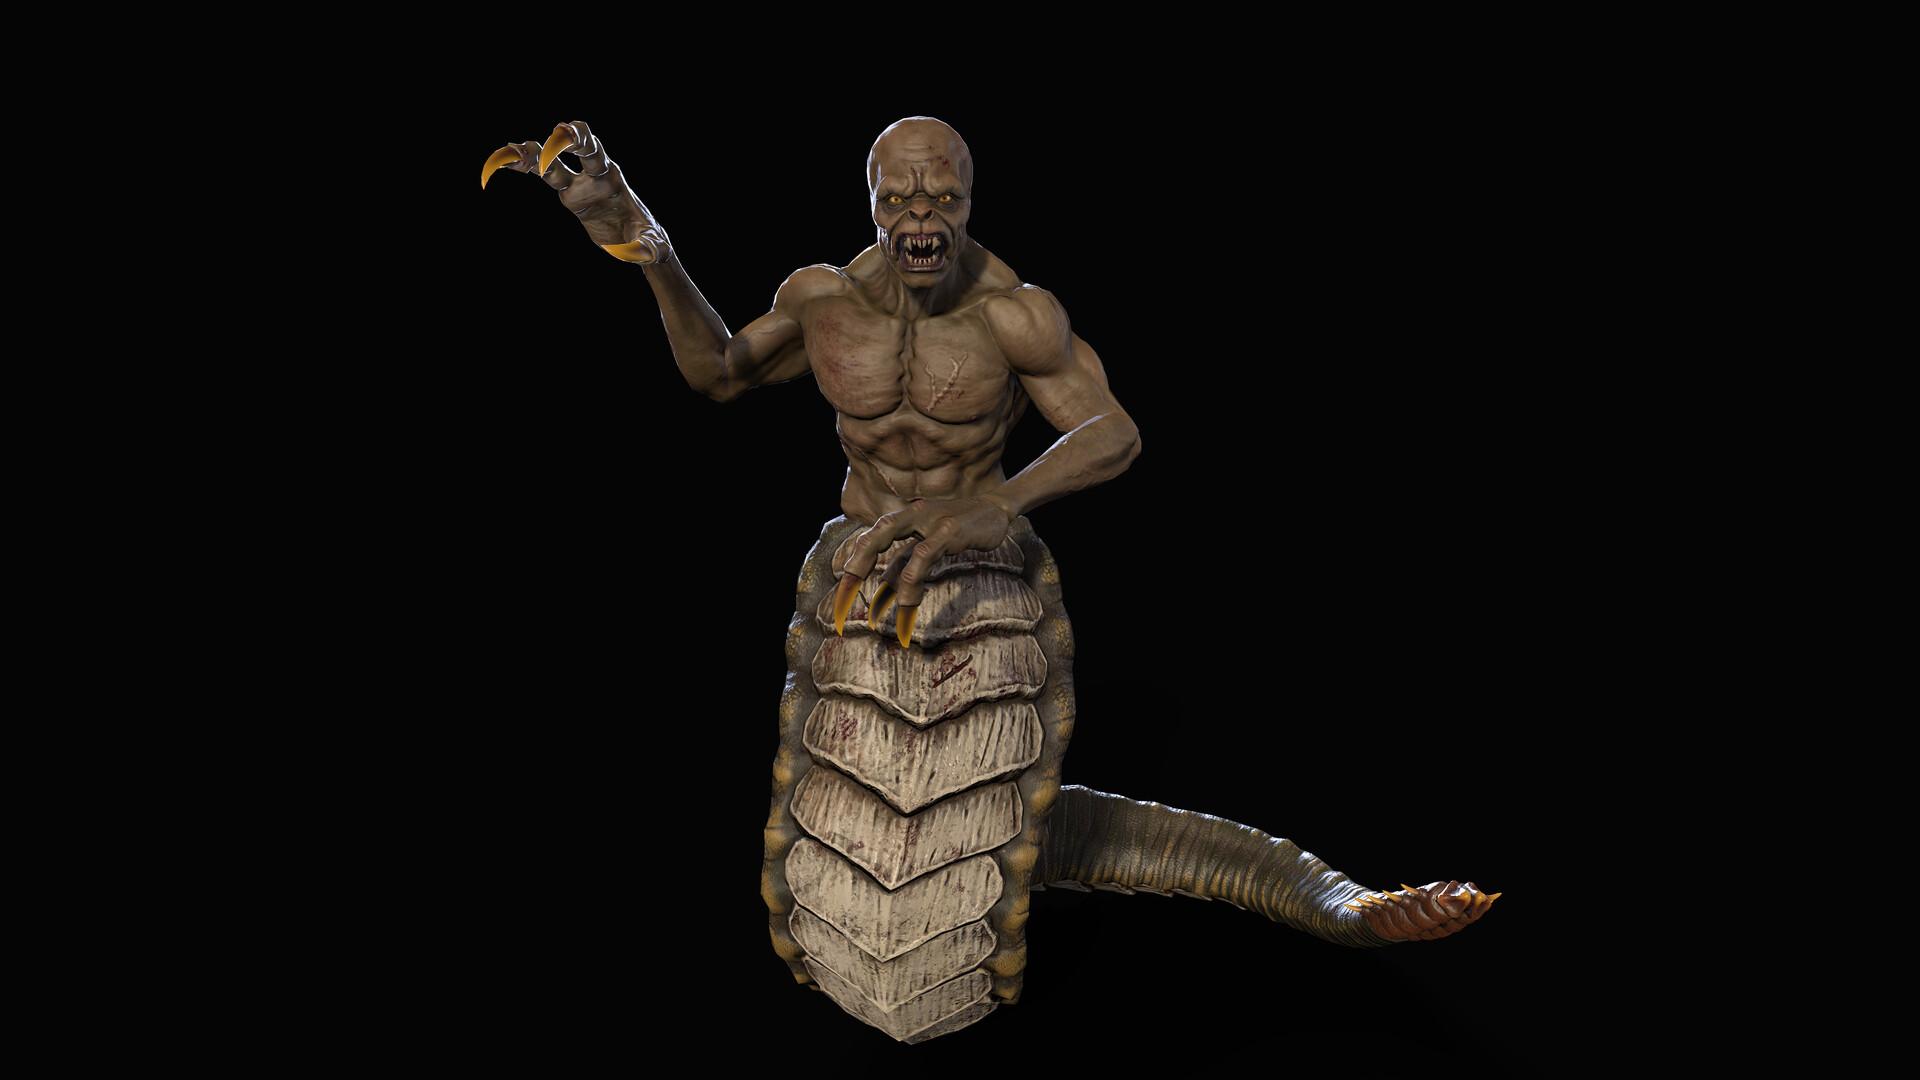 sergey-abanin-reptilian-008